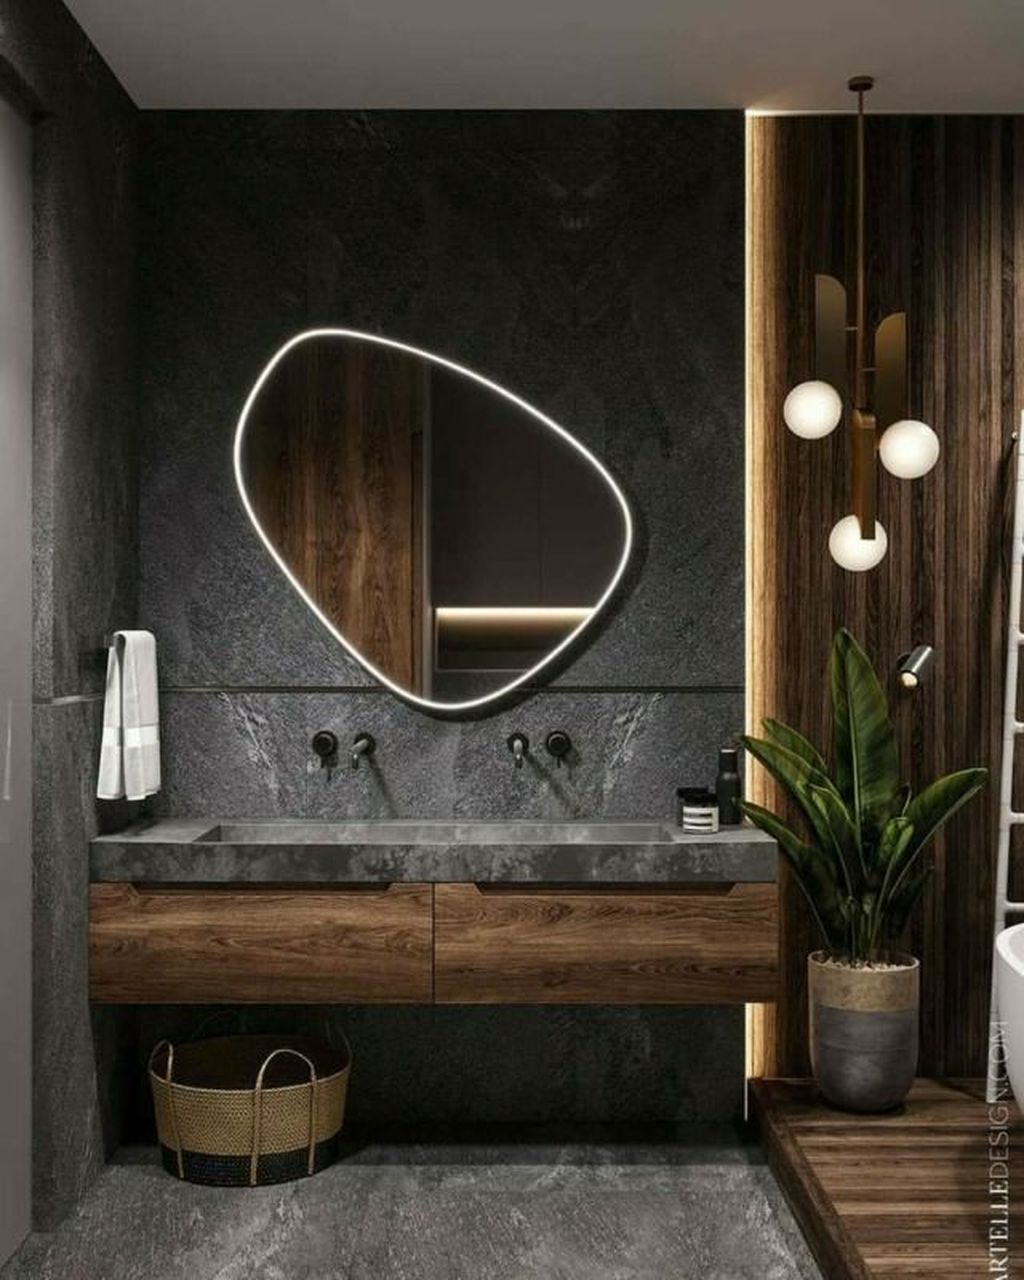 Home Decor Christmas 36 Stunning Nature Bathroom Design Ideas To Get Fresh Look Many People Like Th In 2020 Bathroom Design Luxury Natural Bathroom Bathroom Interior